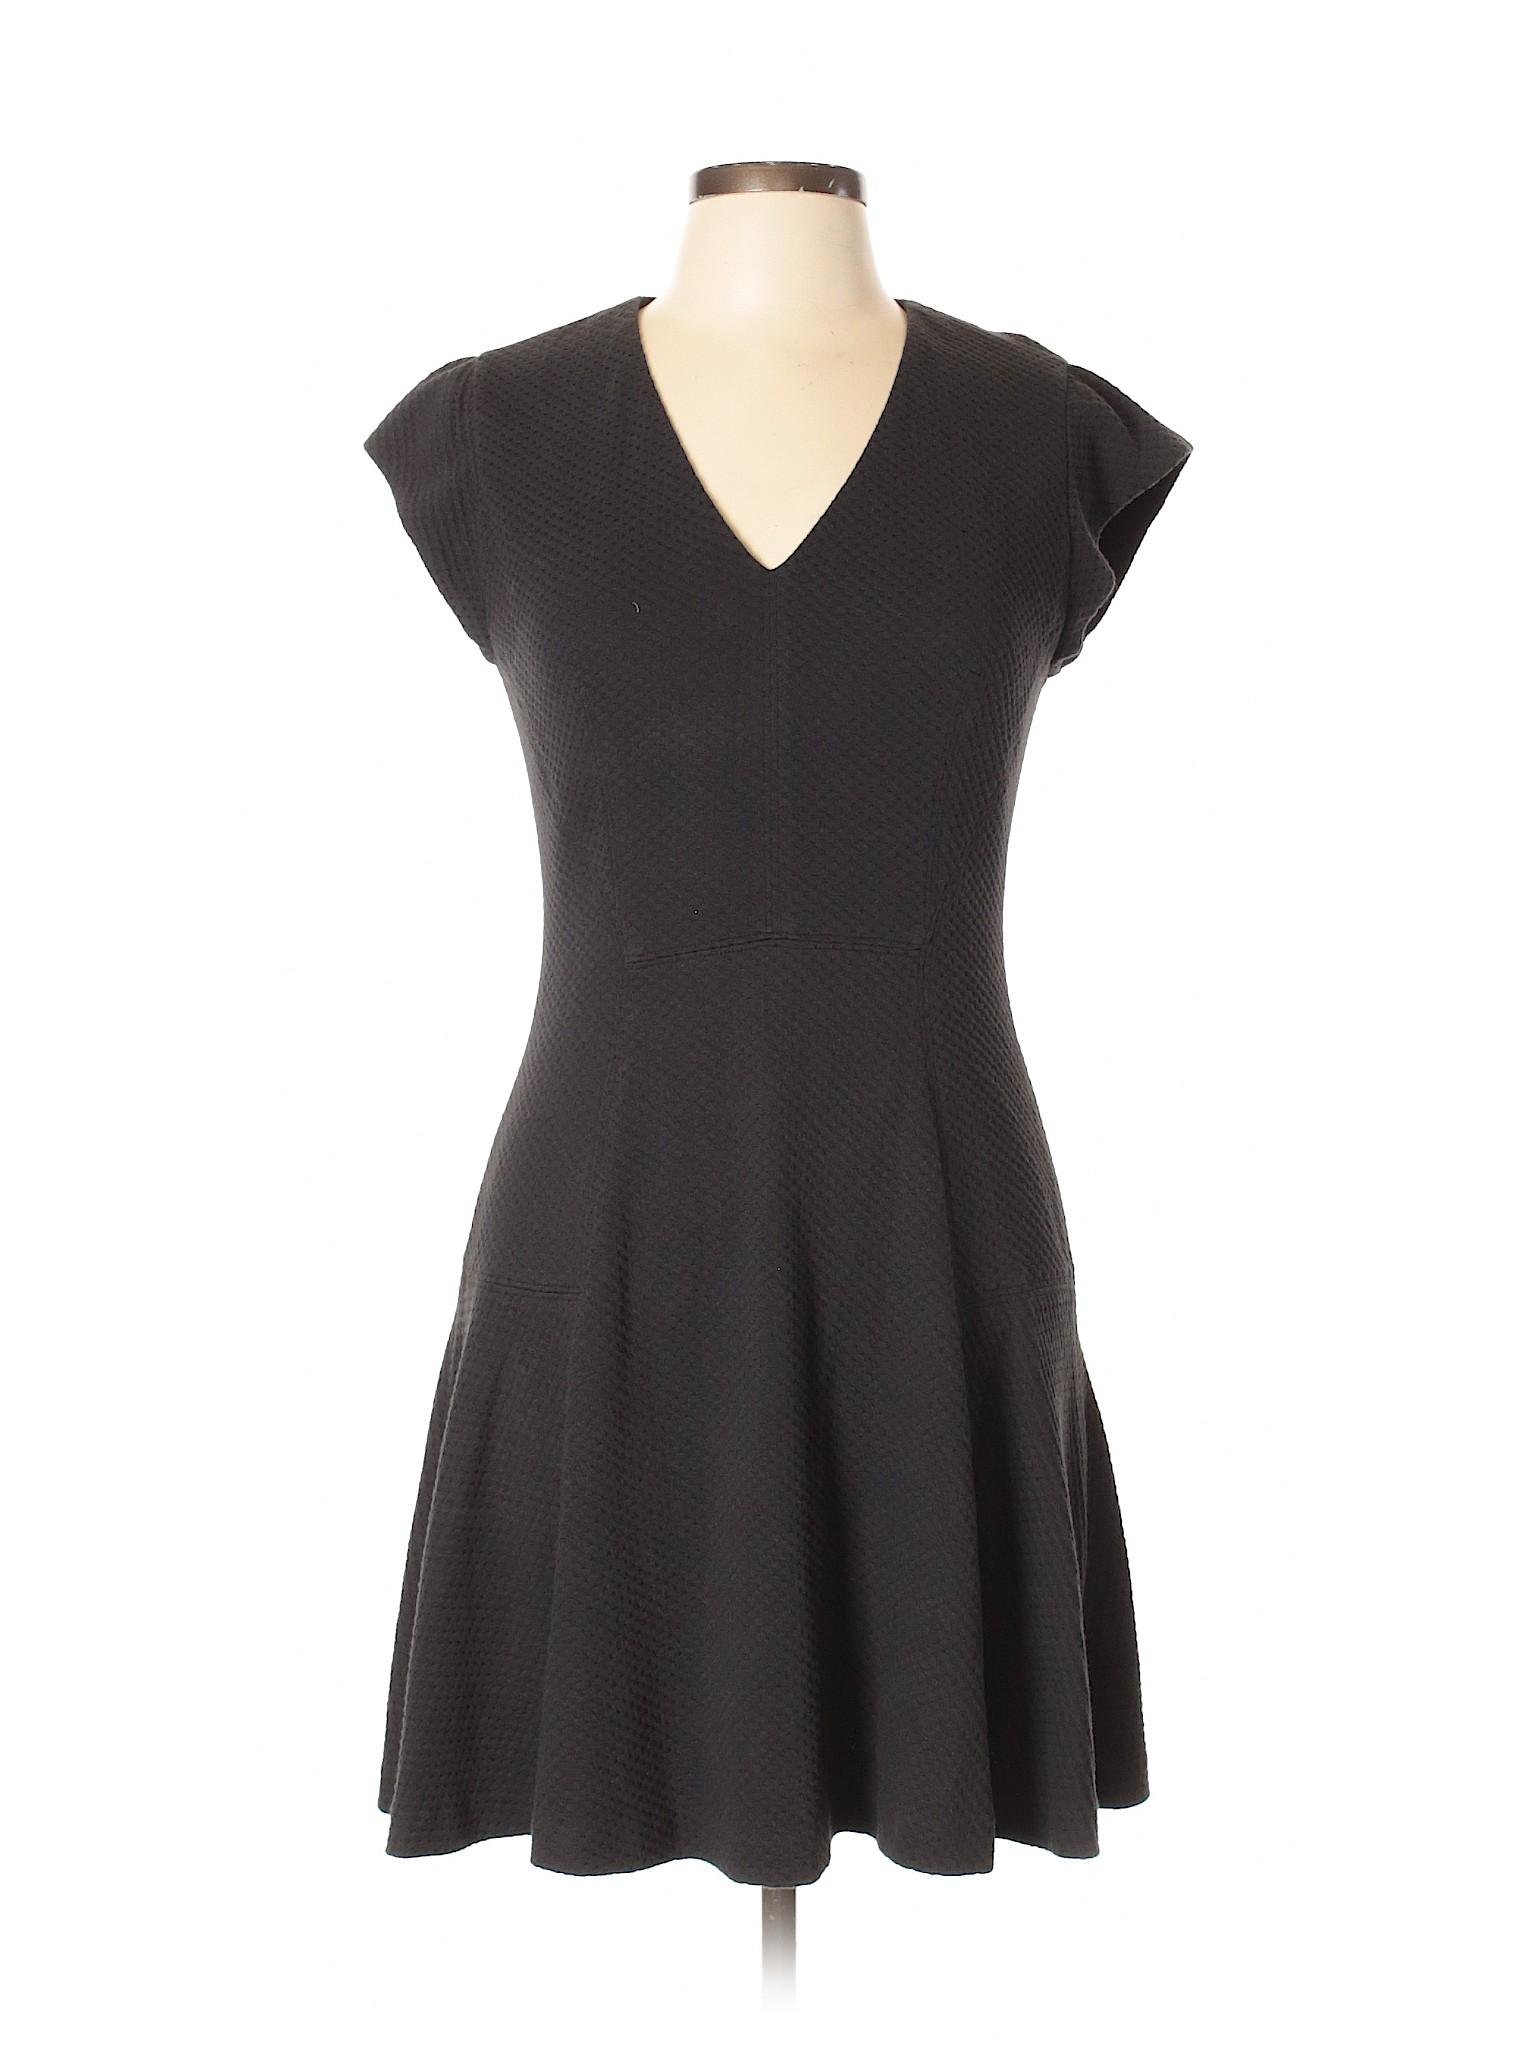 Casual Taylor Boutique Winter Dress Rebecca w7UtWqUR